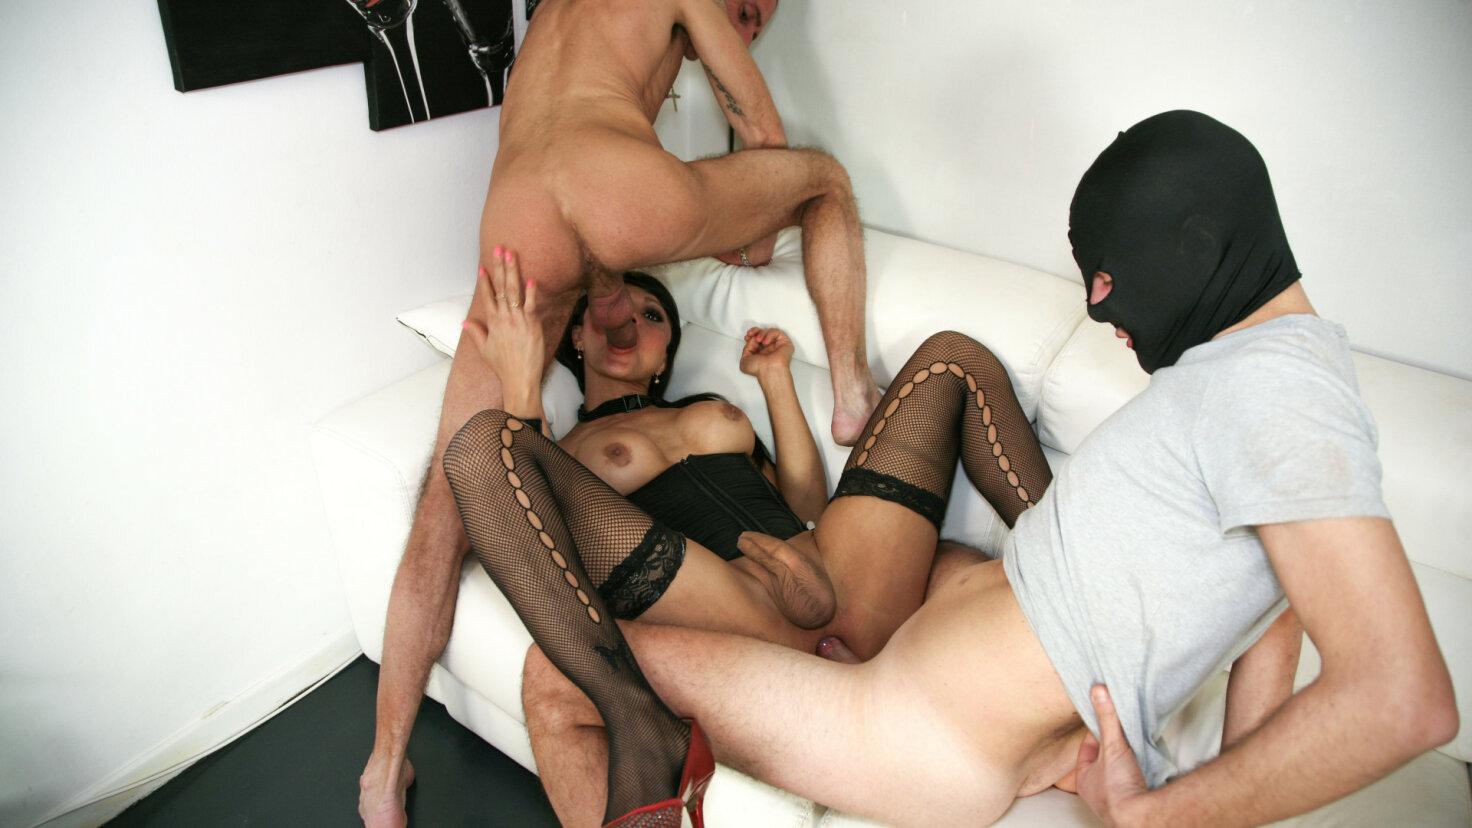 Hot Latina tranny Fabian Feitosa gets two hard cocks in wild threesome